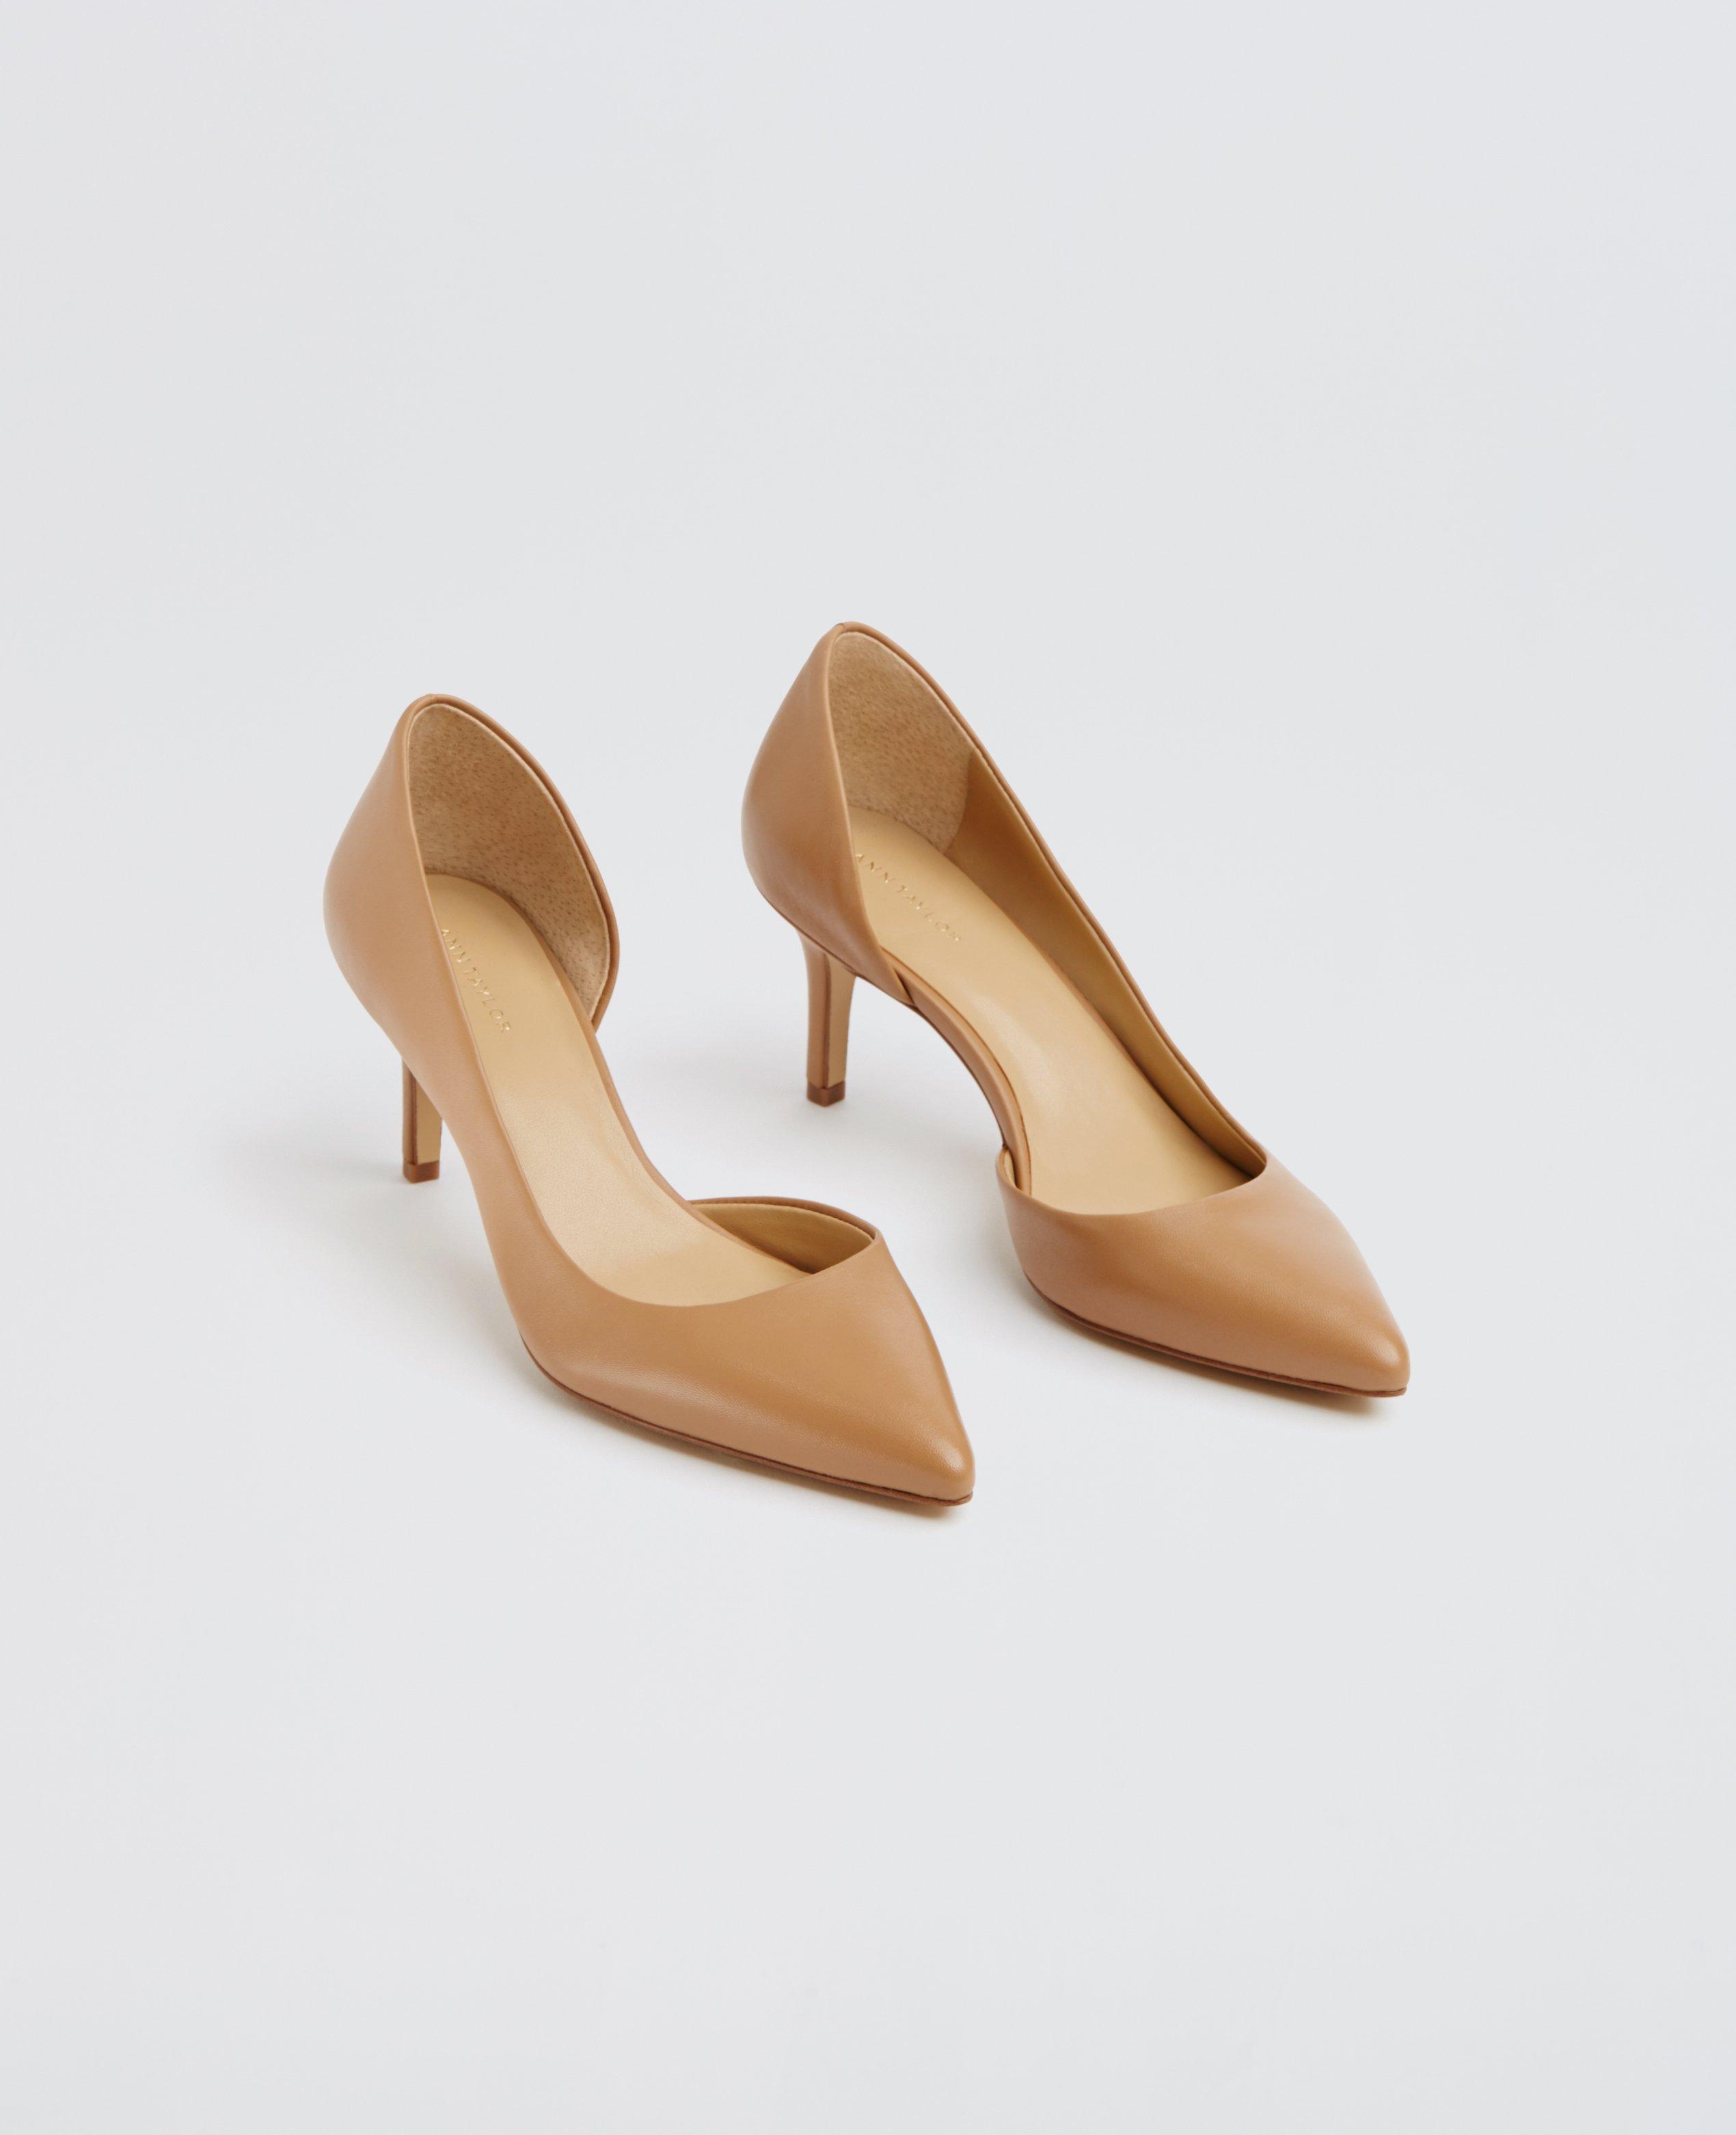 Ann taylor Mari D'orsay Leather Kitten Heels in Natural | Lyst